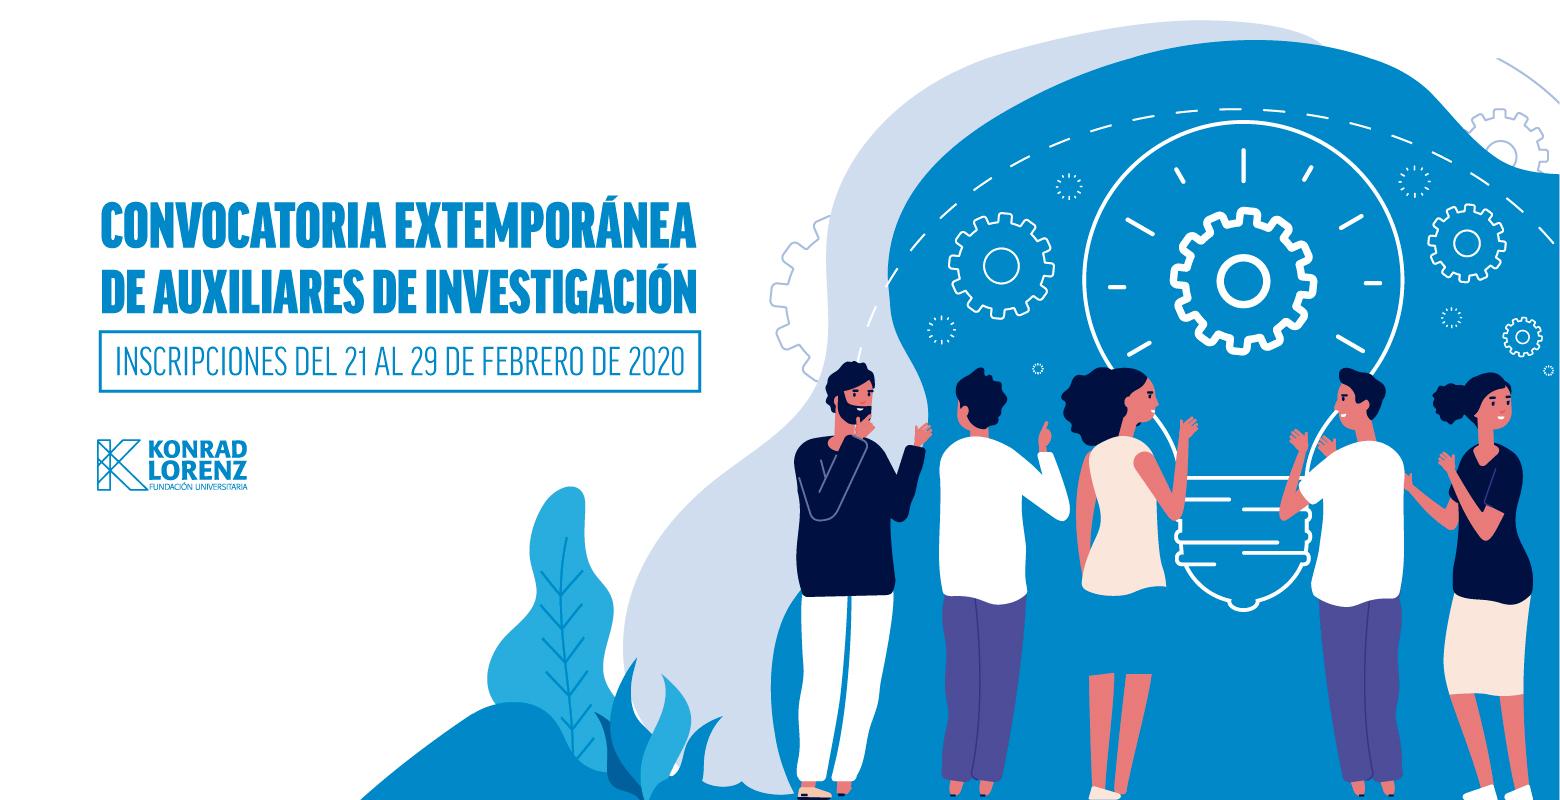 CONVOCATORIA EXTEMPORÁNEA AUXILIARES DE INVESTIGACIÓN 2020